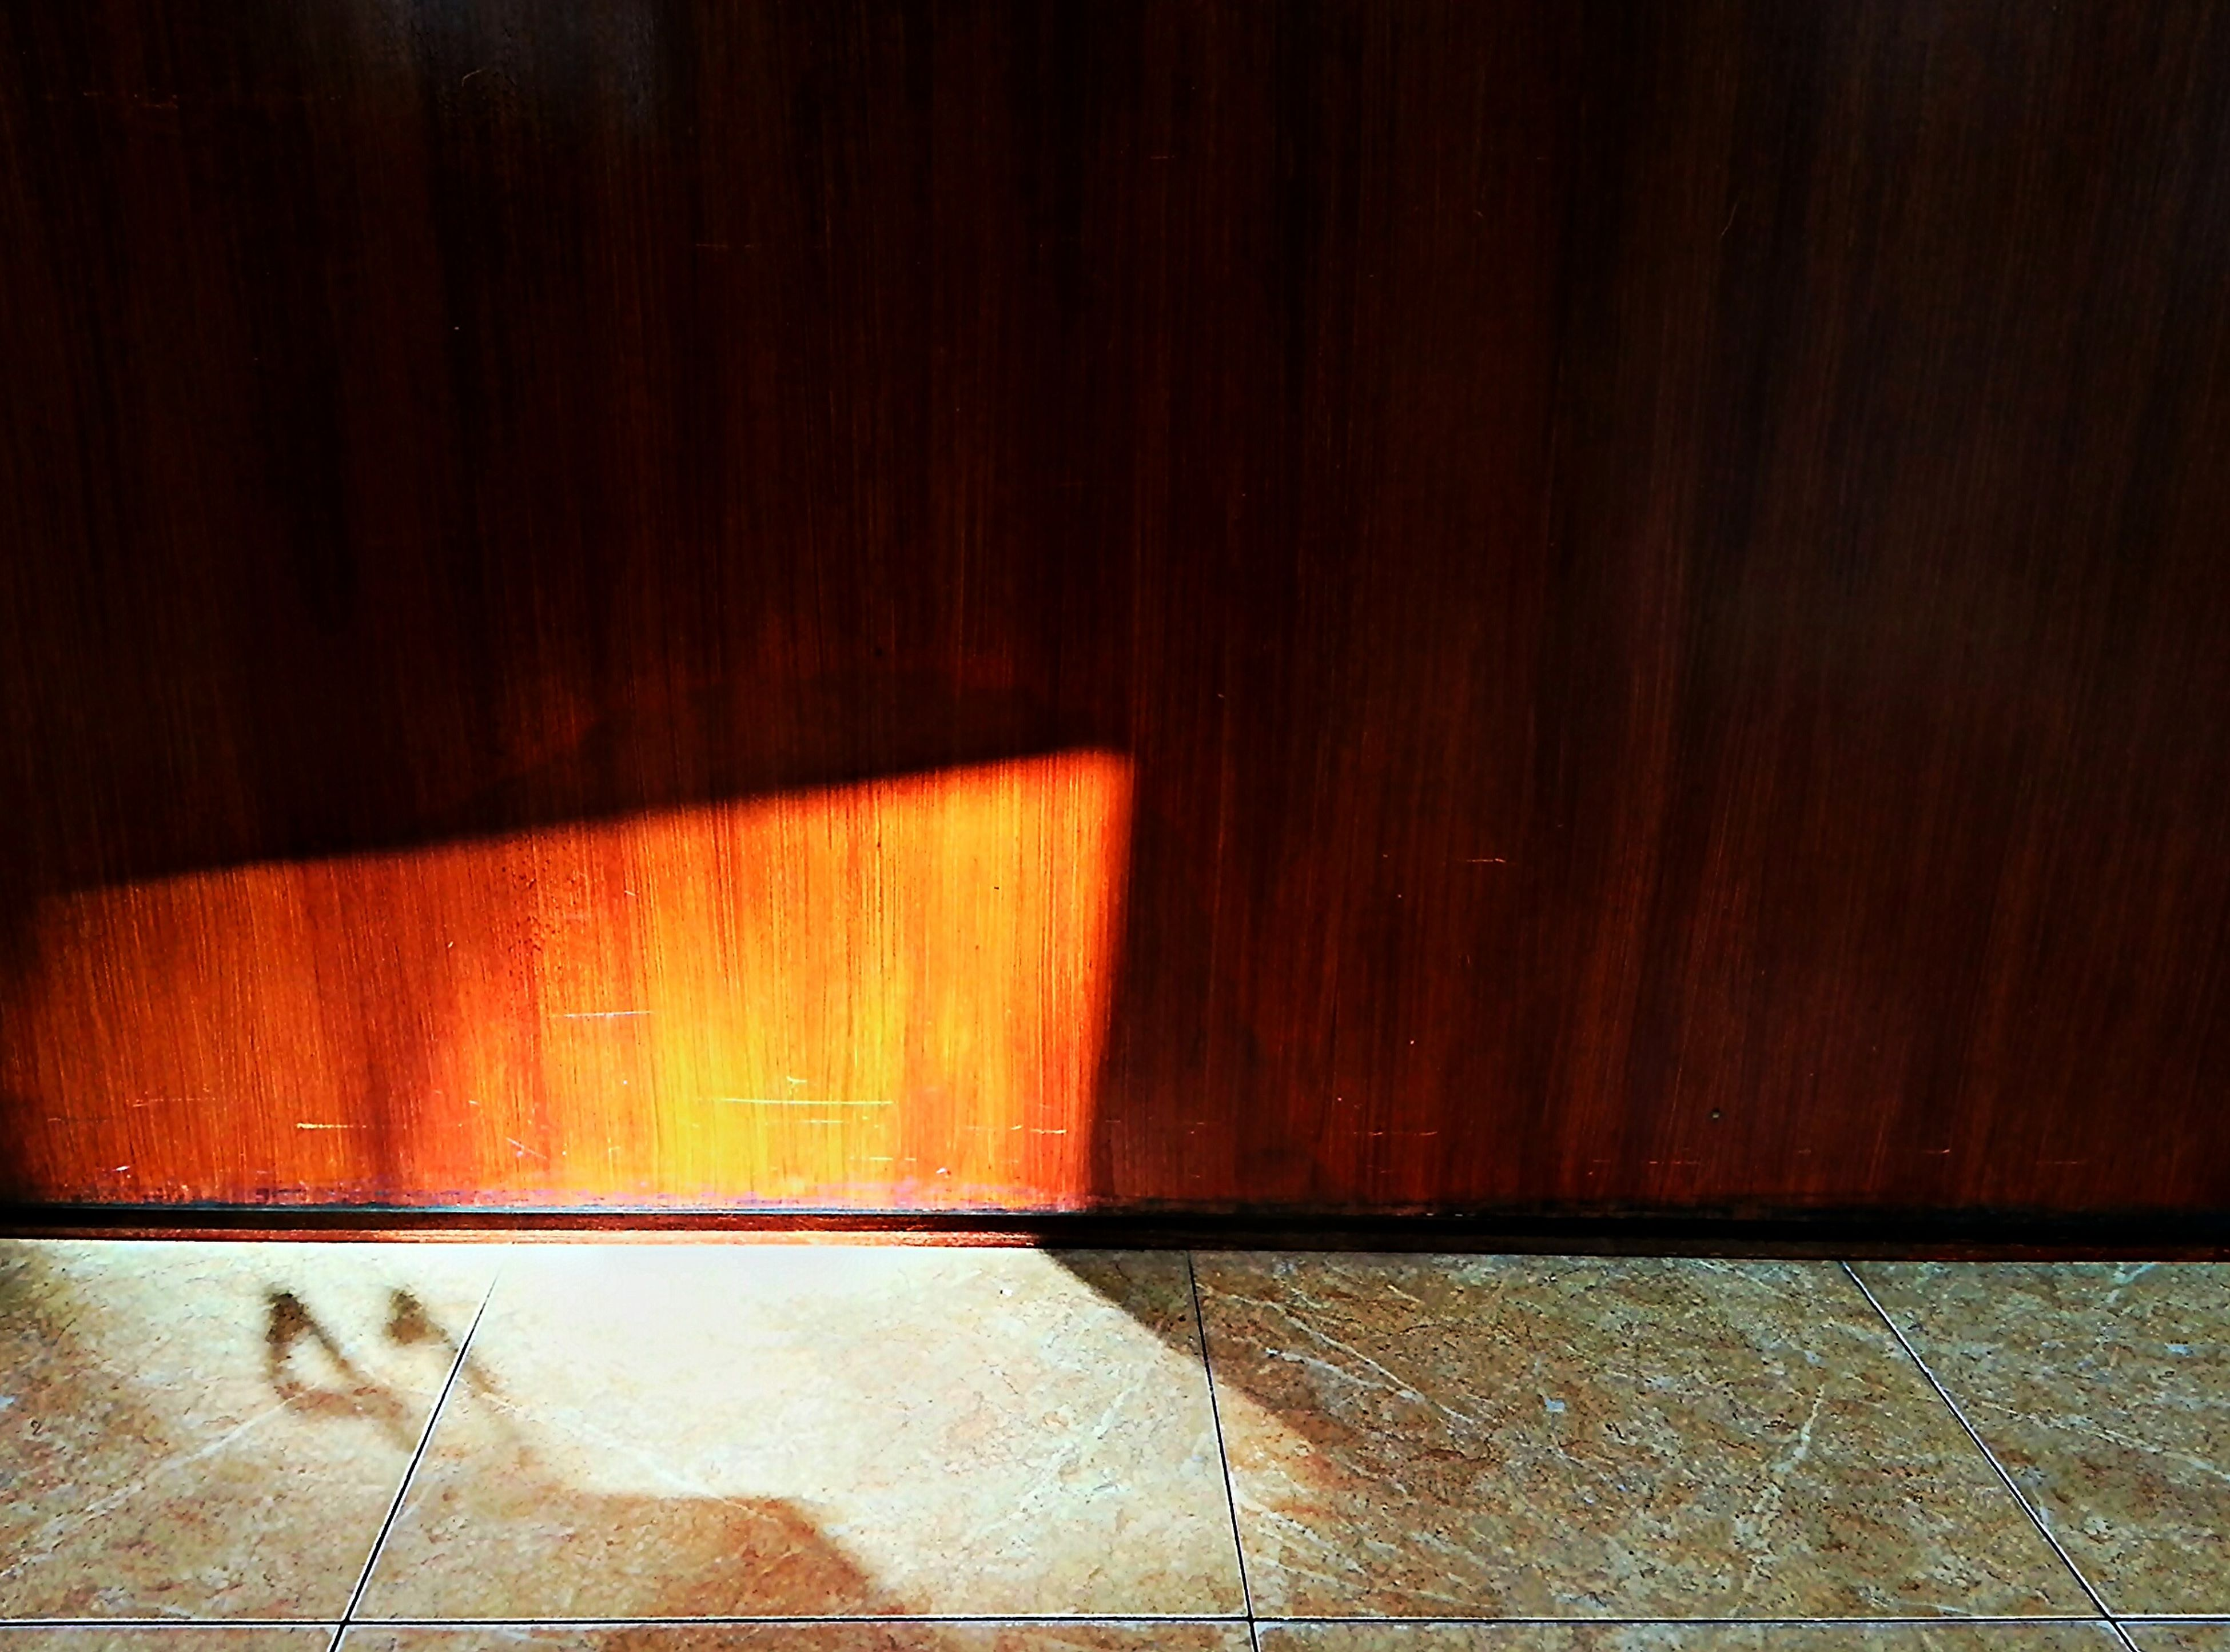 indoors, wood - material, flooring, wall - building feature, shadow, empty, wooden, door, hardwood floor, built structure, architecture, absence, tiled floor, sunlight, wood, wall, no people, high angle view, floor, home interior